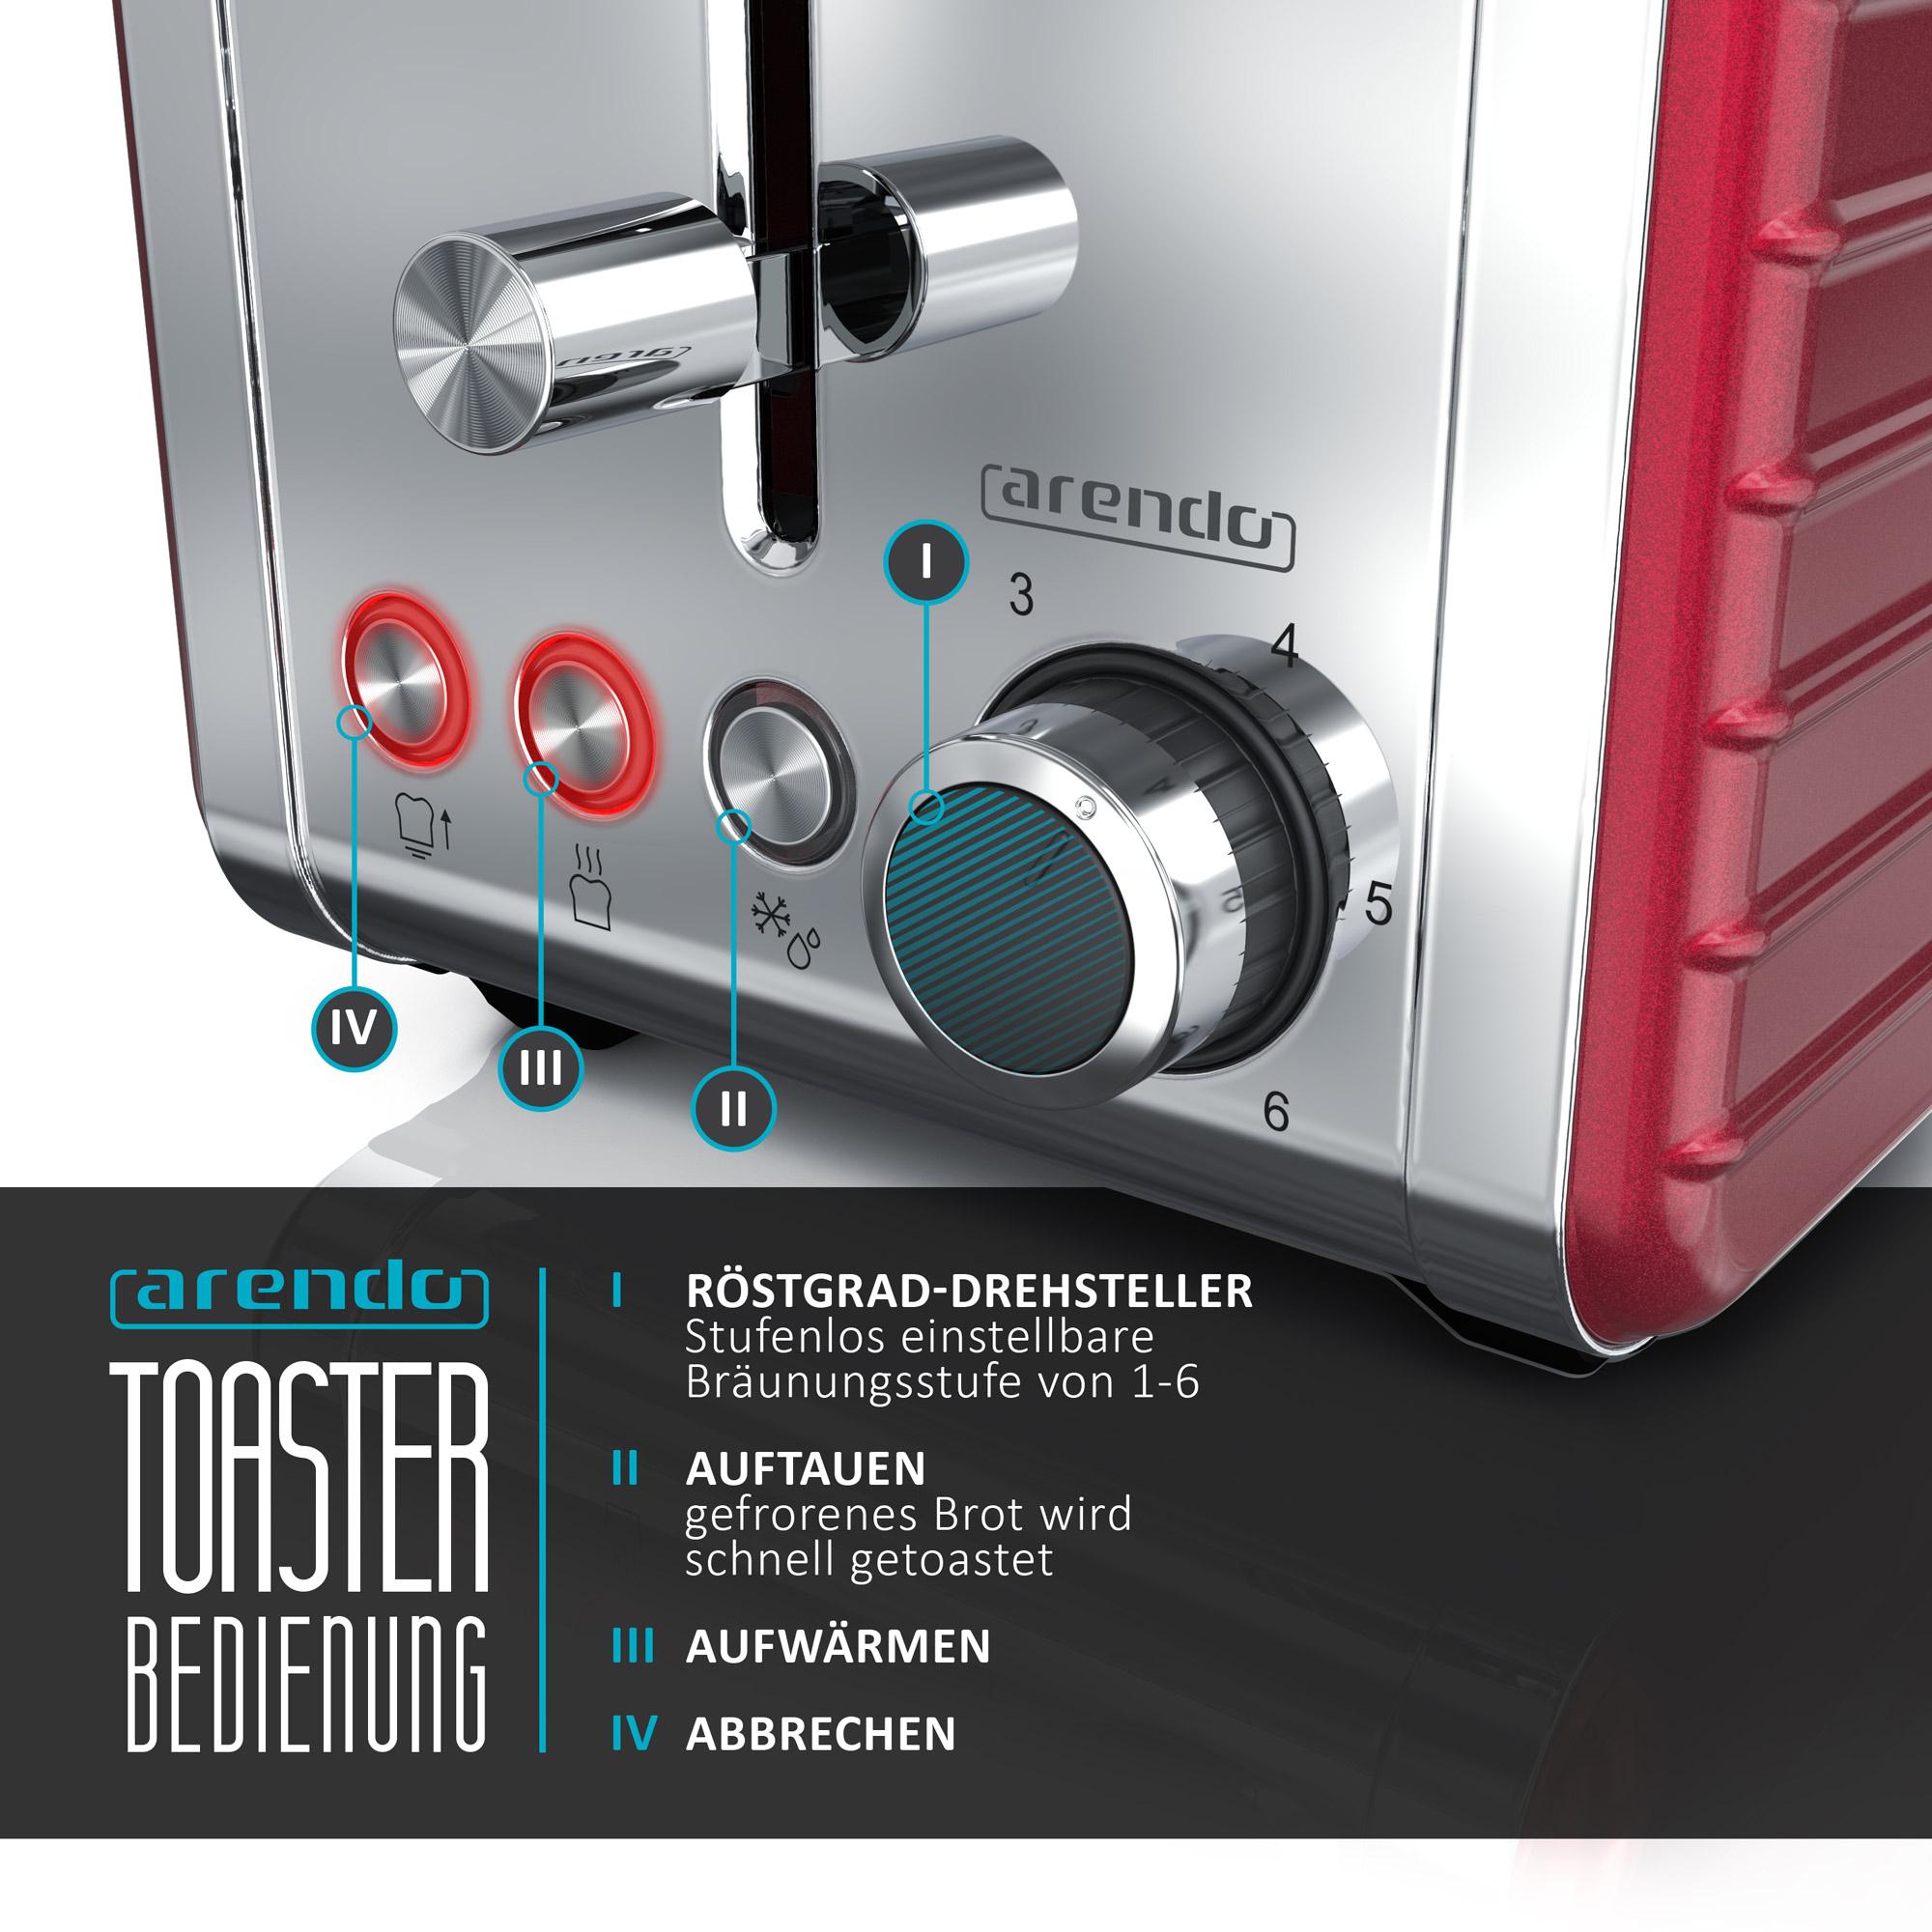 303264_toaster_schalter_grafik.jpg